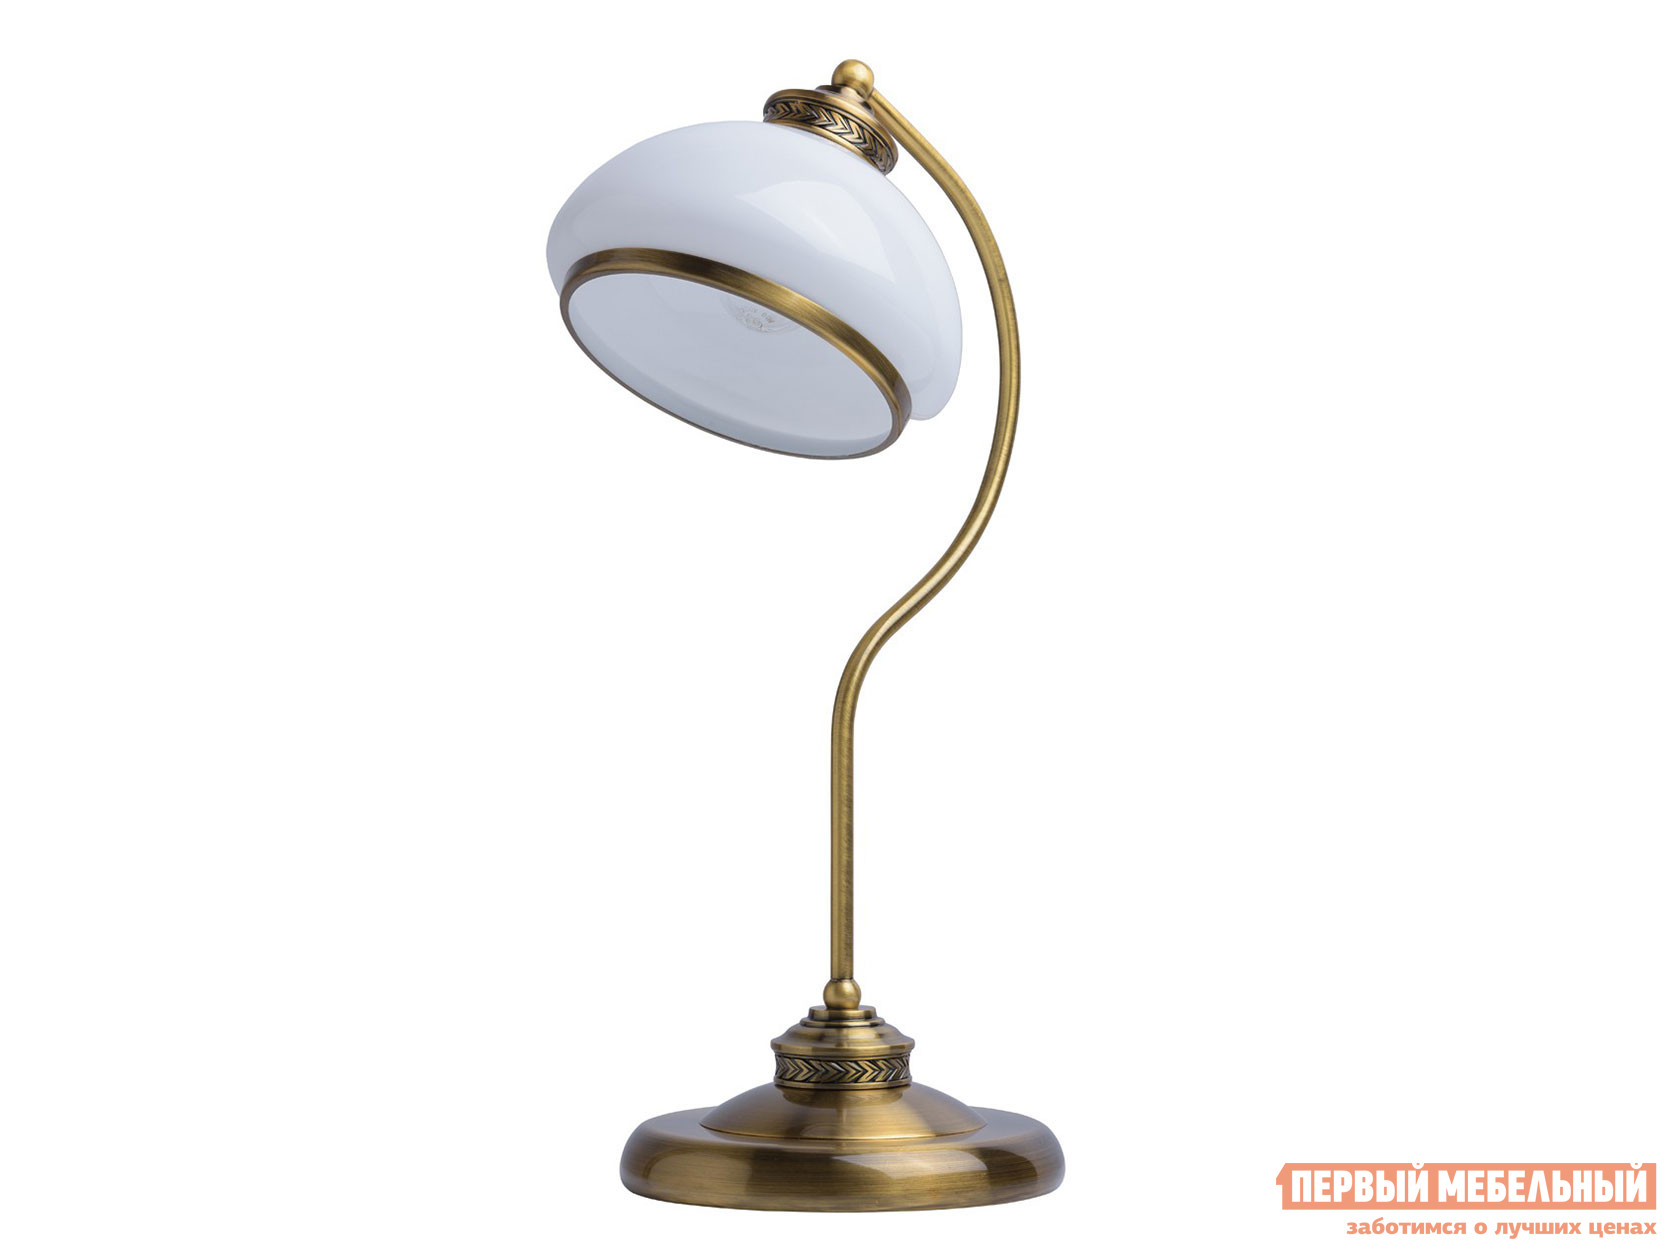 Настольная лампа Штерн 481031301 Аманда недорого